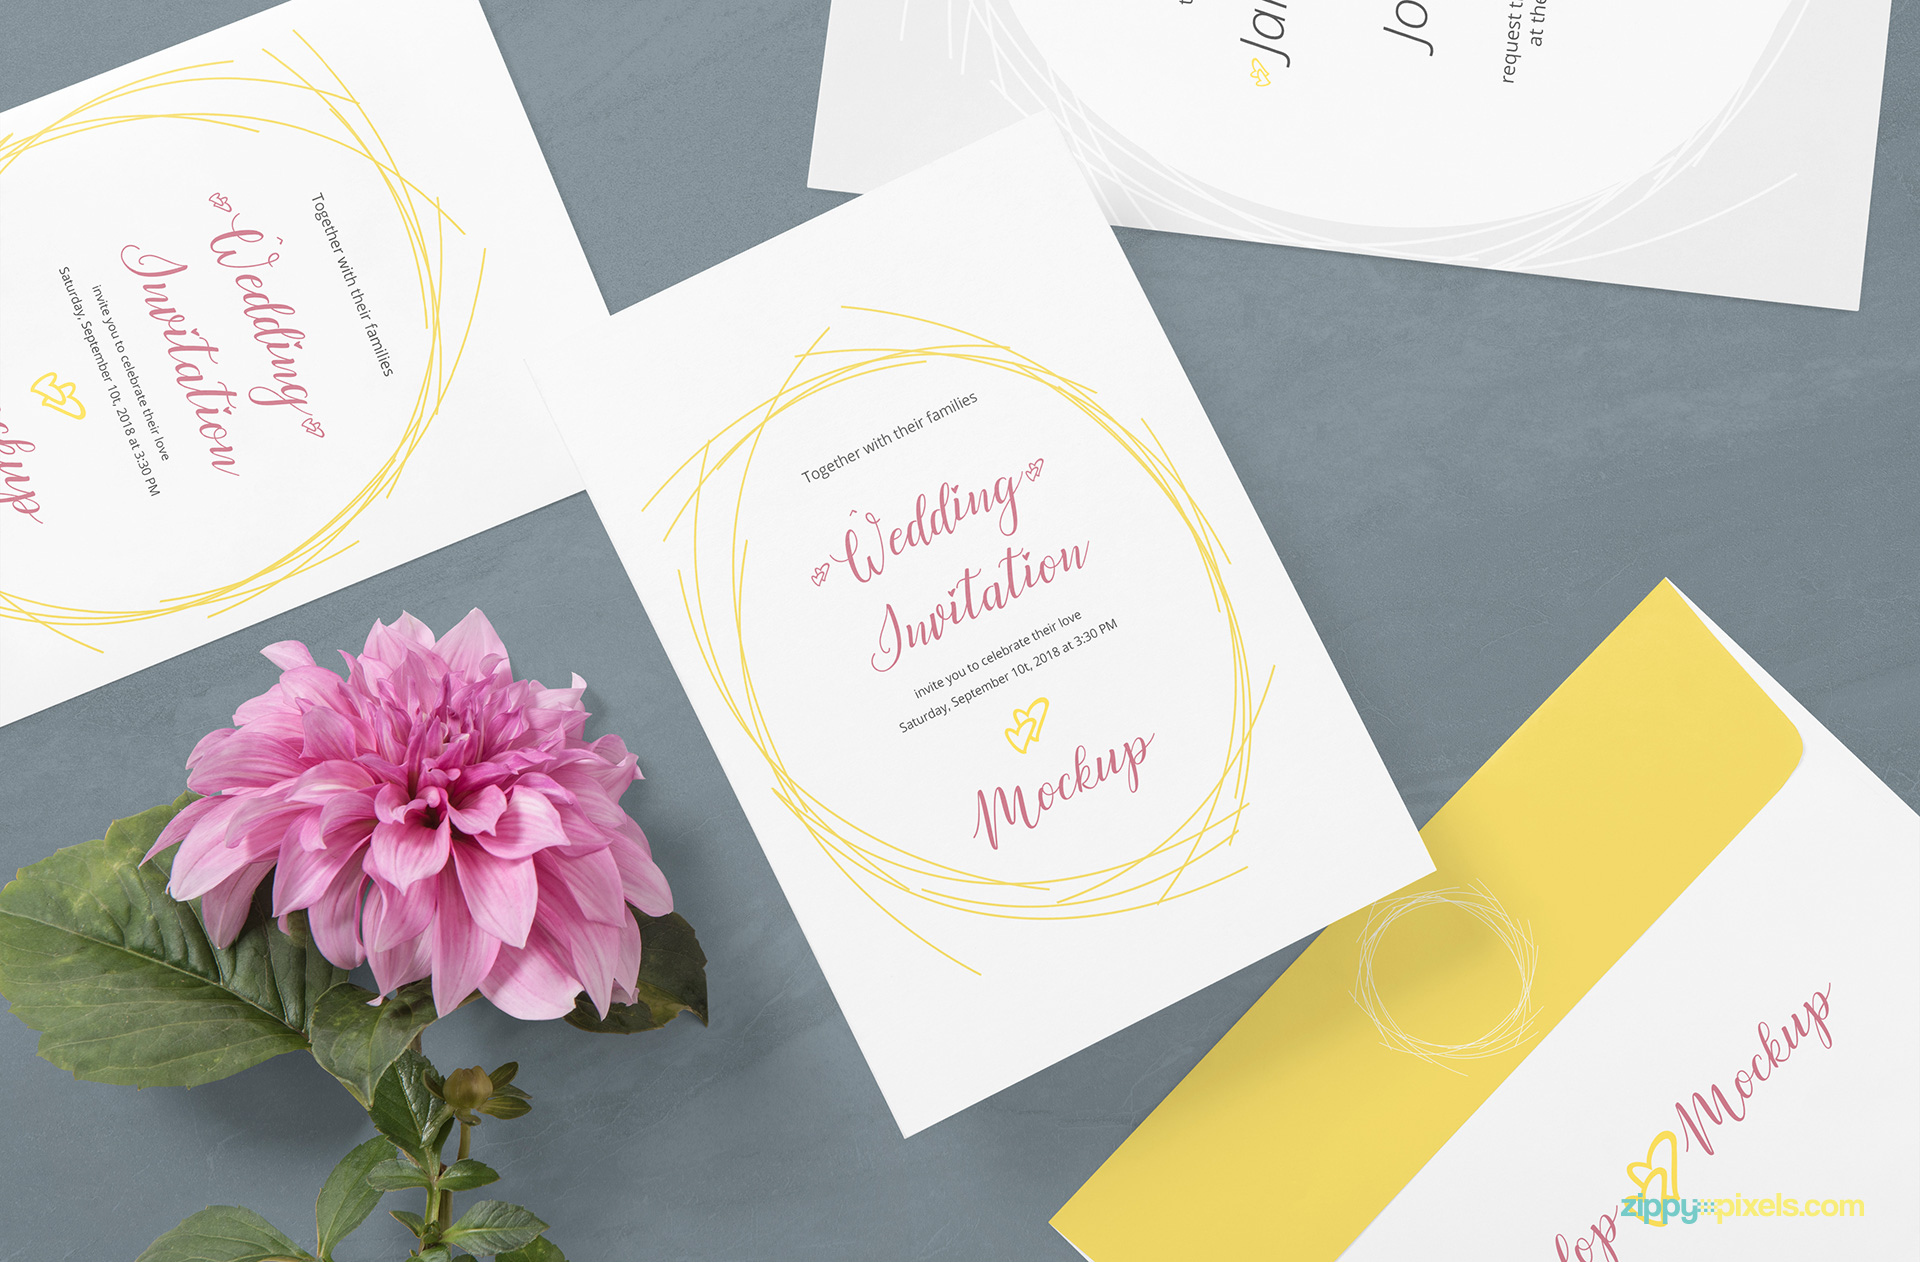 Wedding invitation mockup including 3 cards and one envelope.